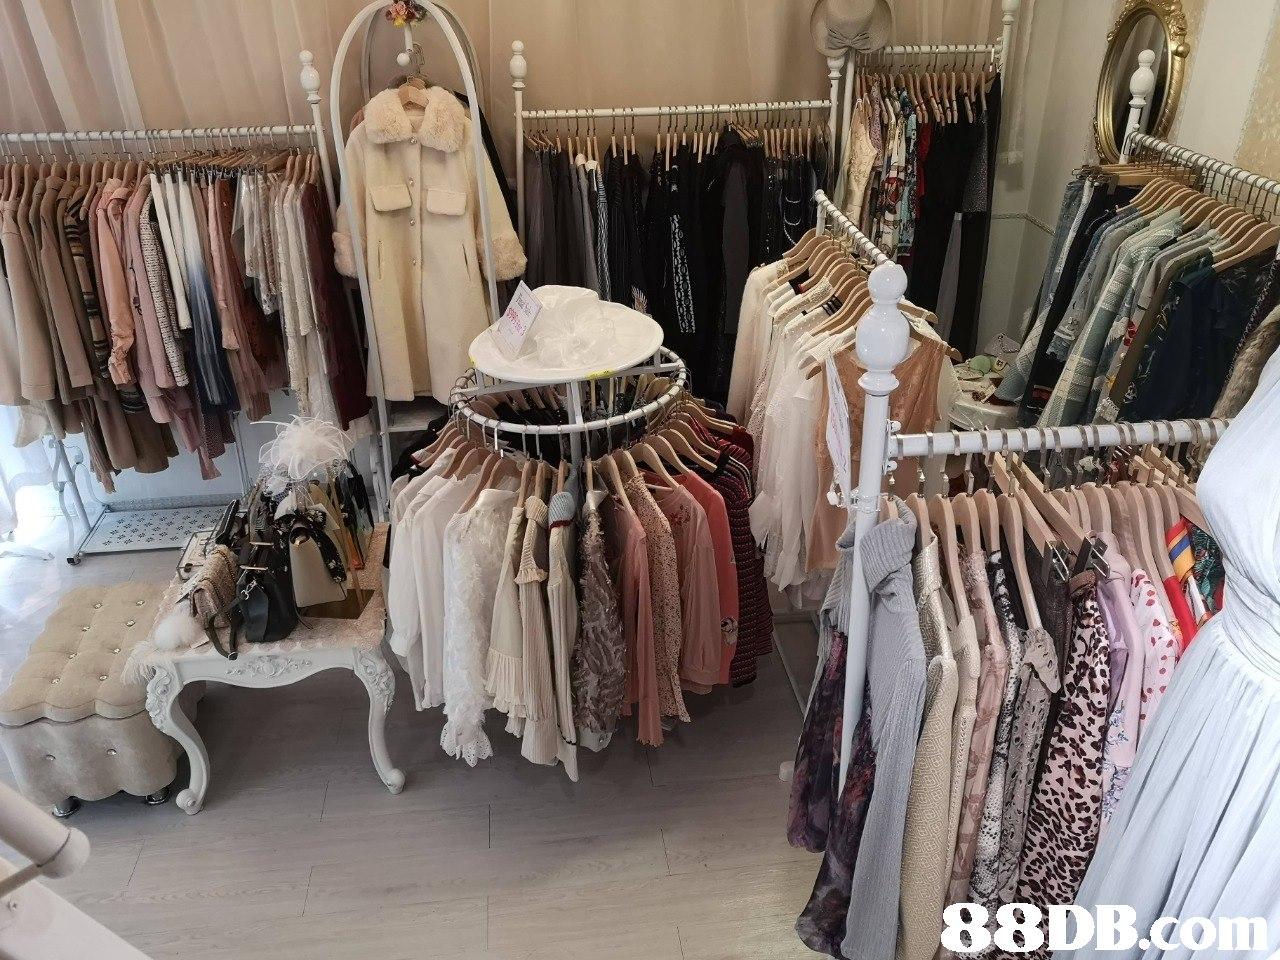 88DB.om  Boutique,Room,Clothes hanger,Textile,Furniture